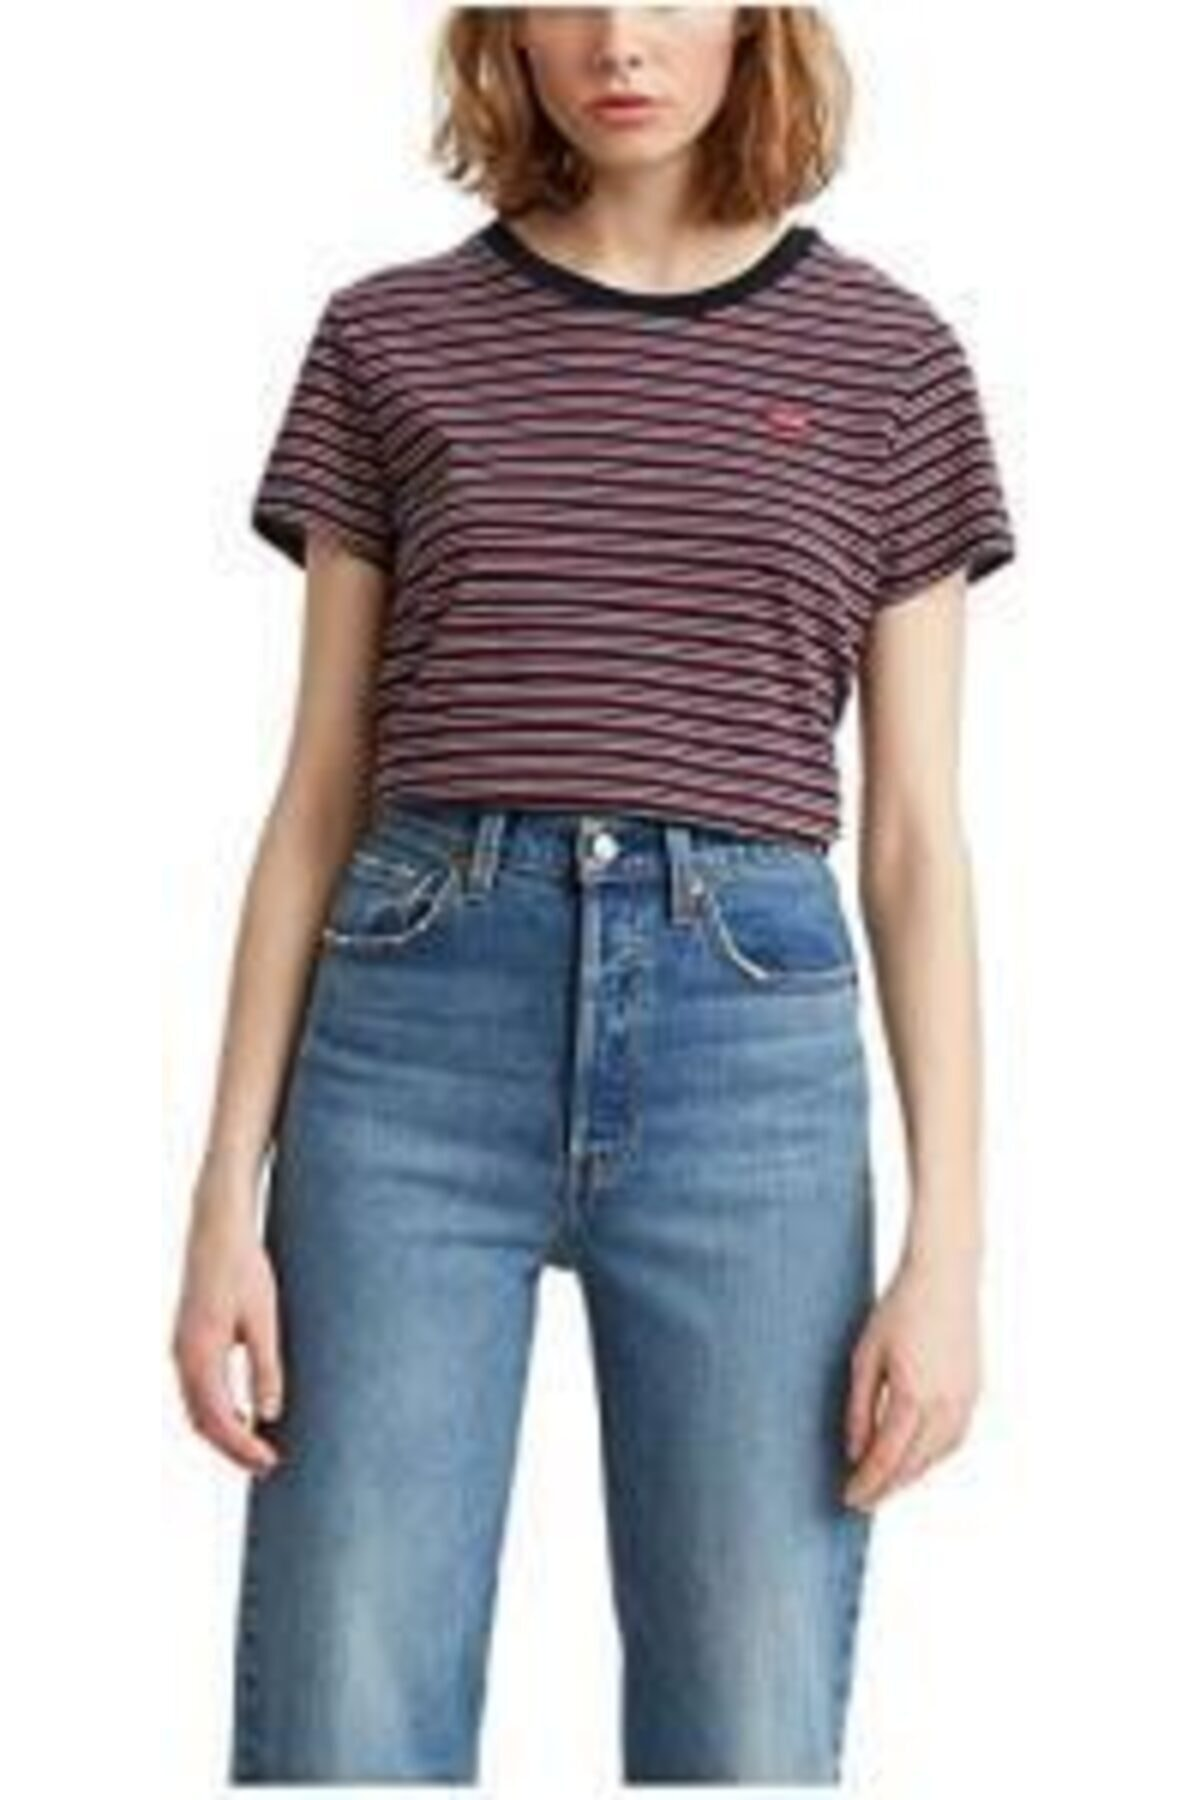 Levi's Kadın T-Shirt 39185-0102 1